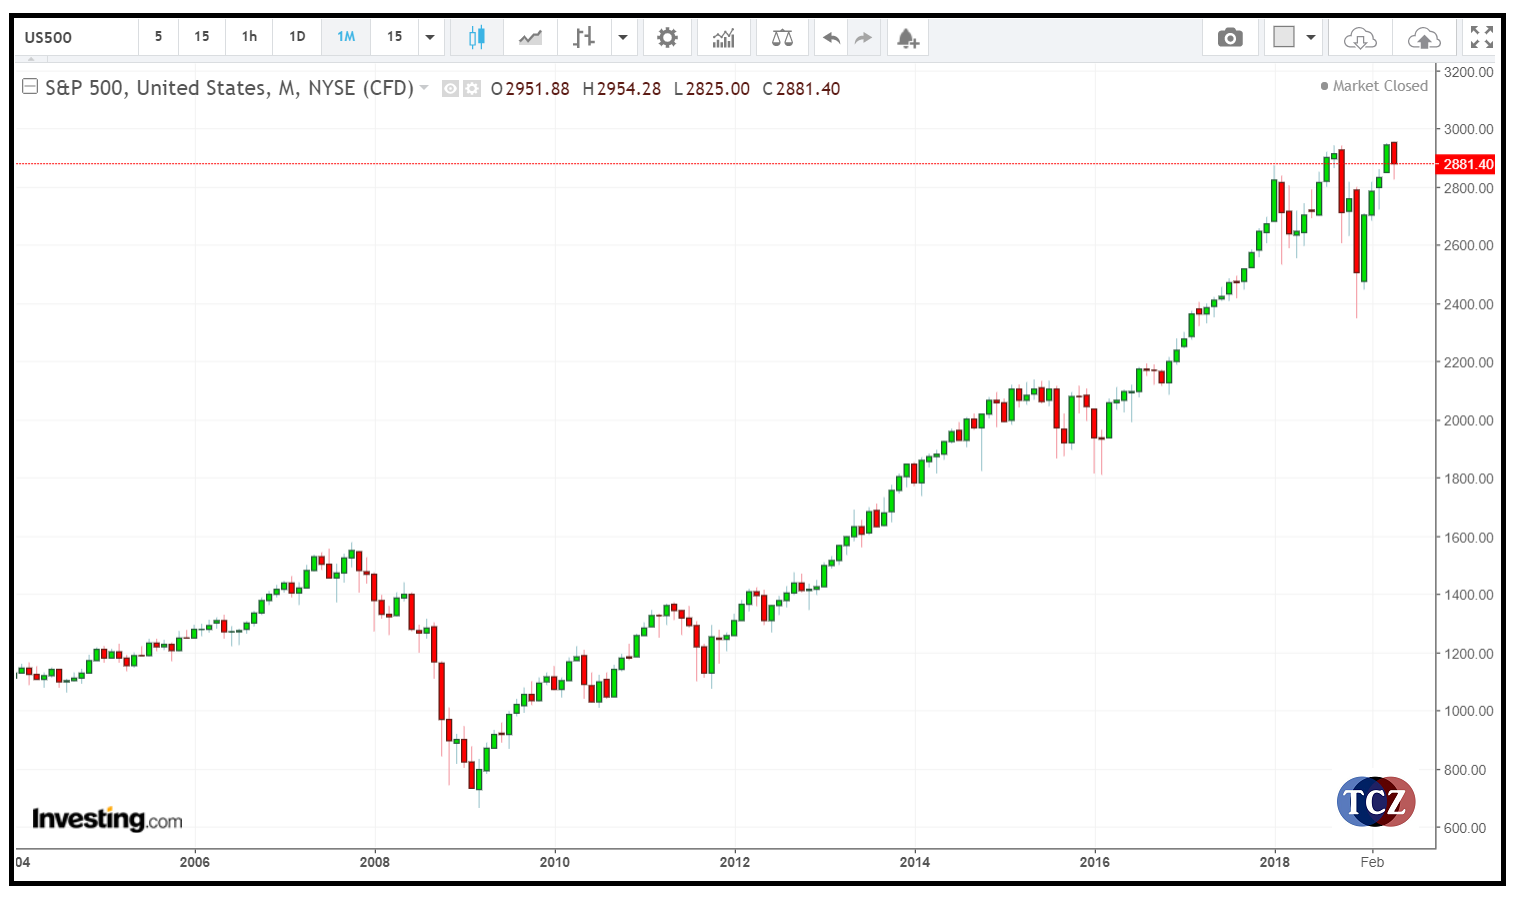 S&P 500 (US500)